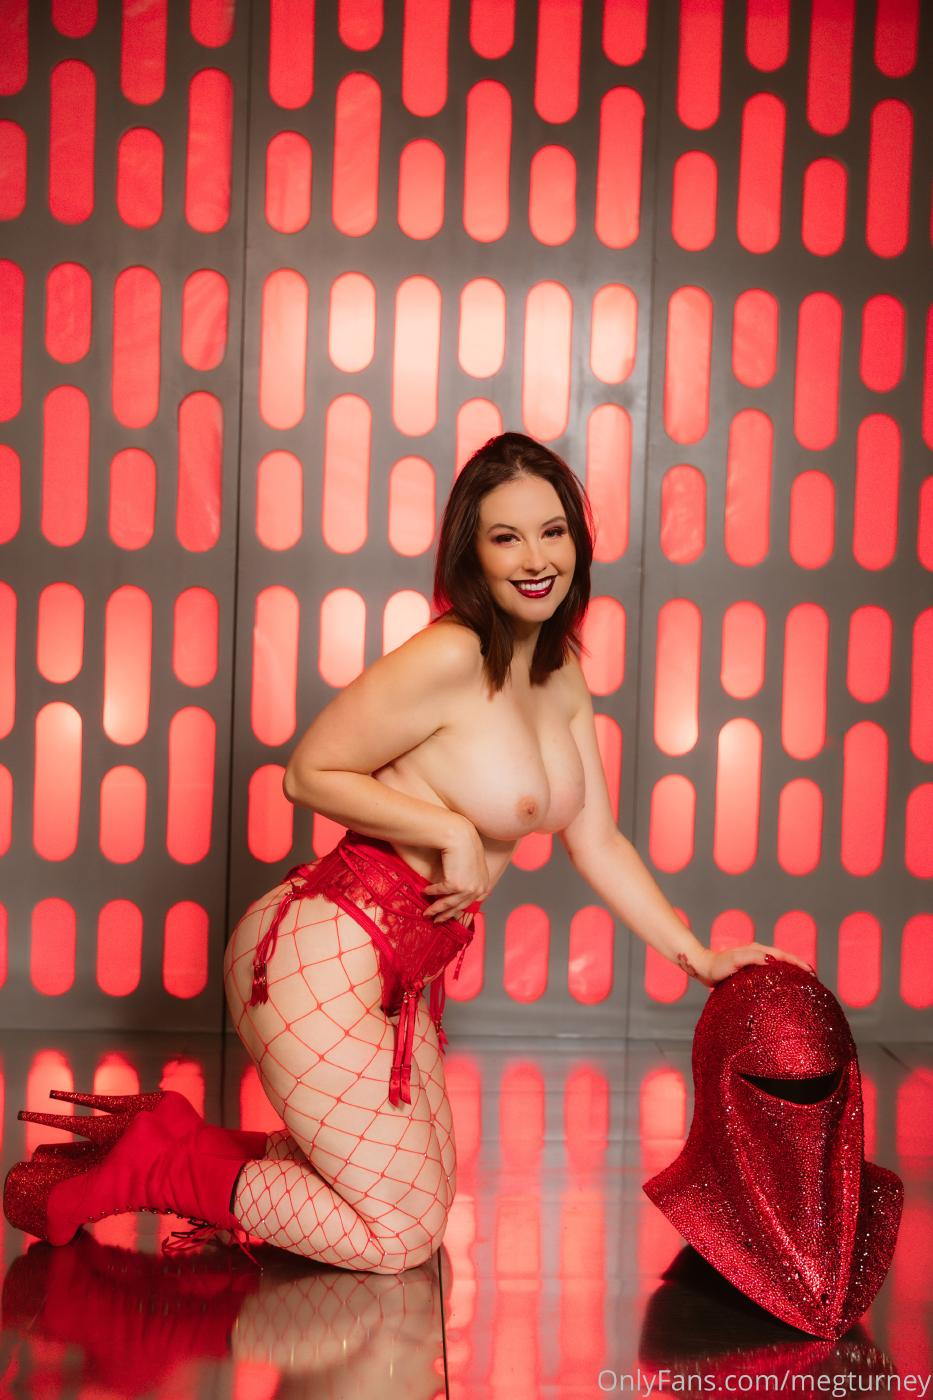 Meg Turney Imperial Guard Topless Cosplay Onlyfans Set Leaked Iixrfj